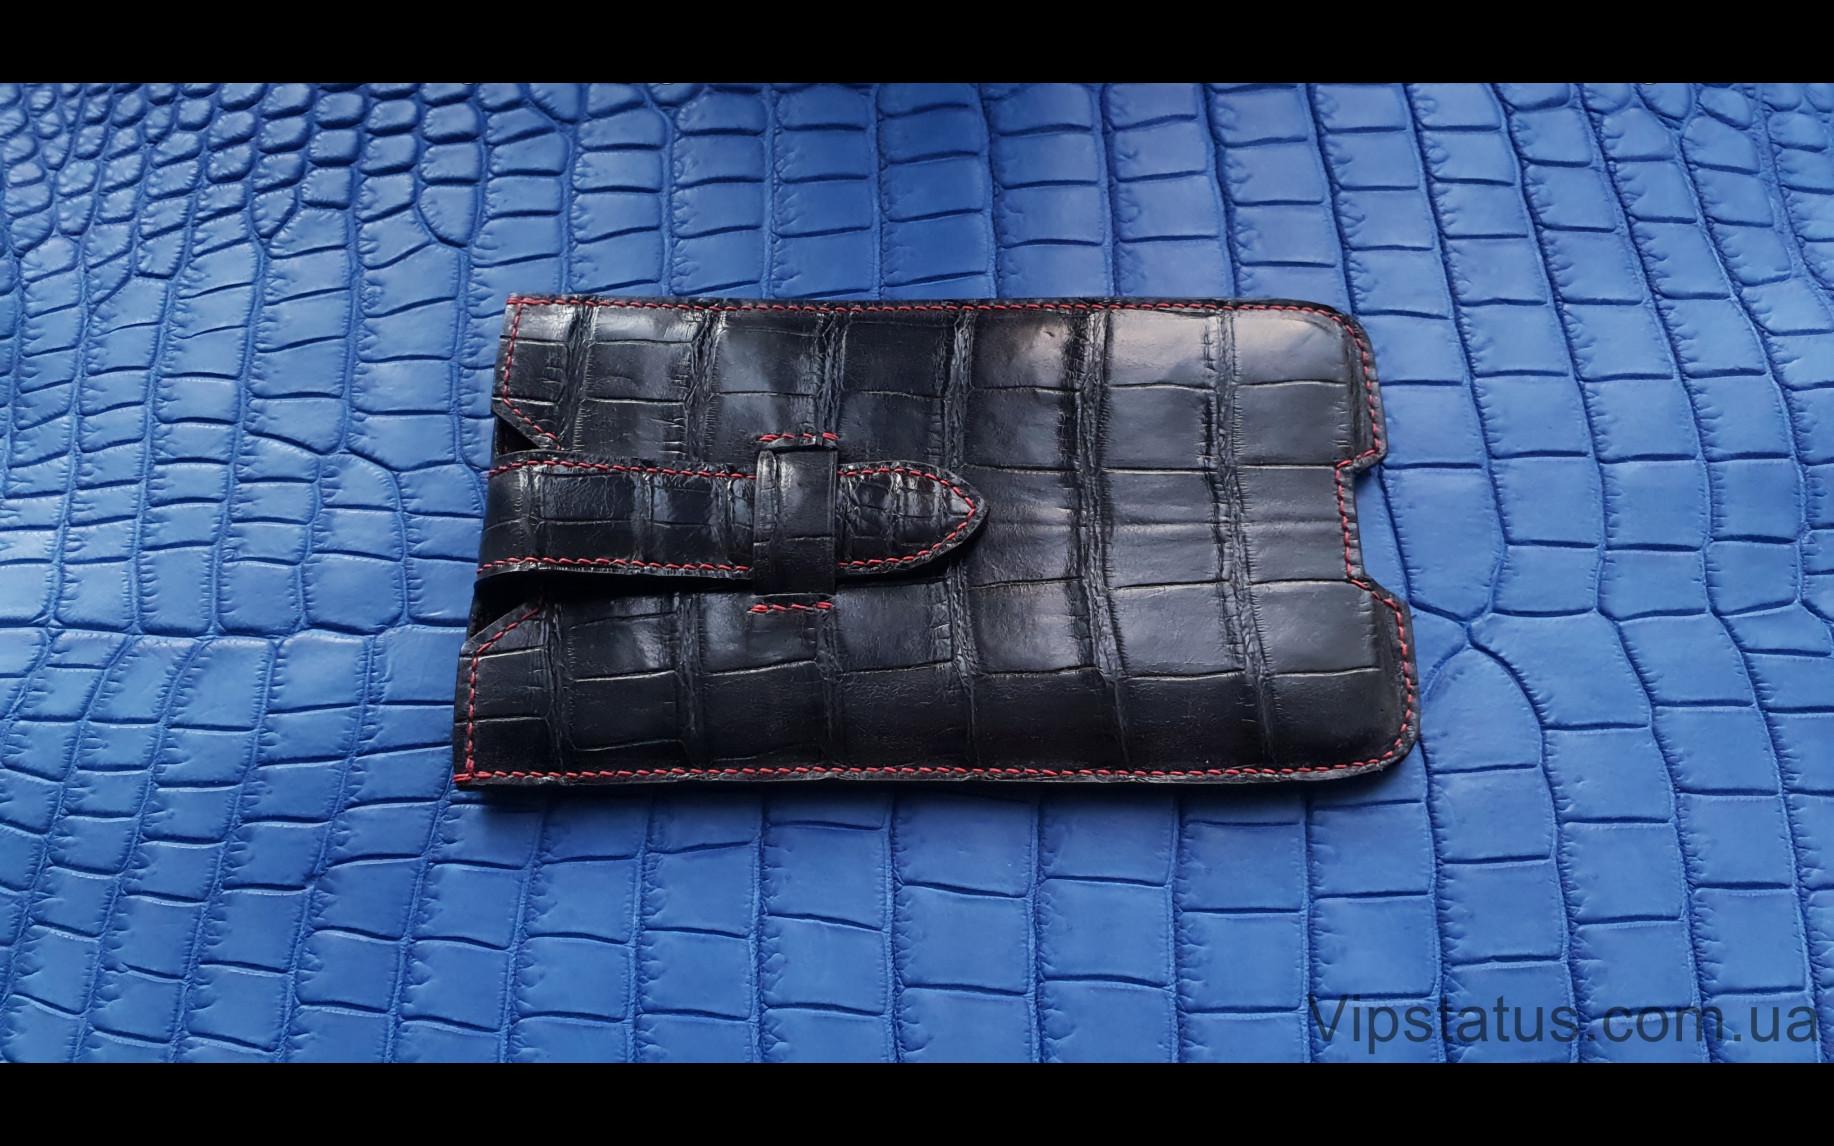 Elite Classic Edition Премиум кейс IPhone X XS 11 Pro 12 Pro Classic Edition Premium case IPhone X XS 11 Pro 12 Pro Crocodile leather image 3